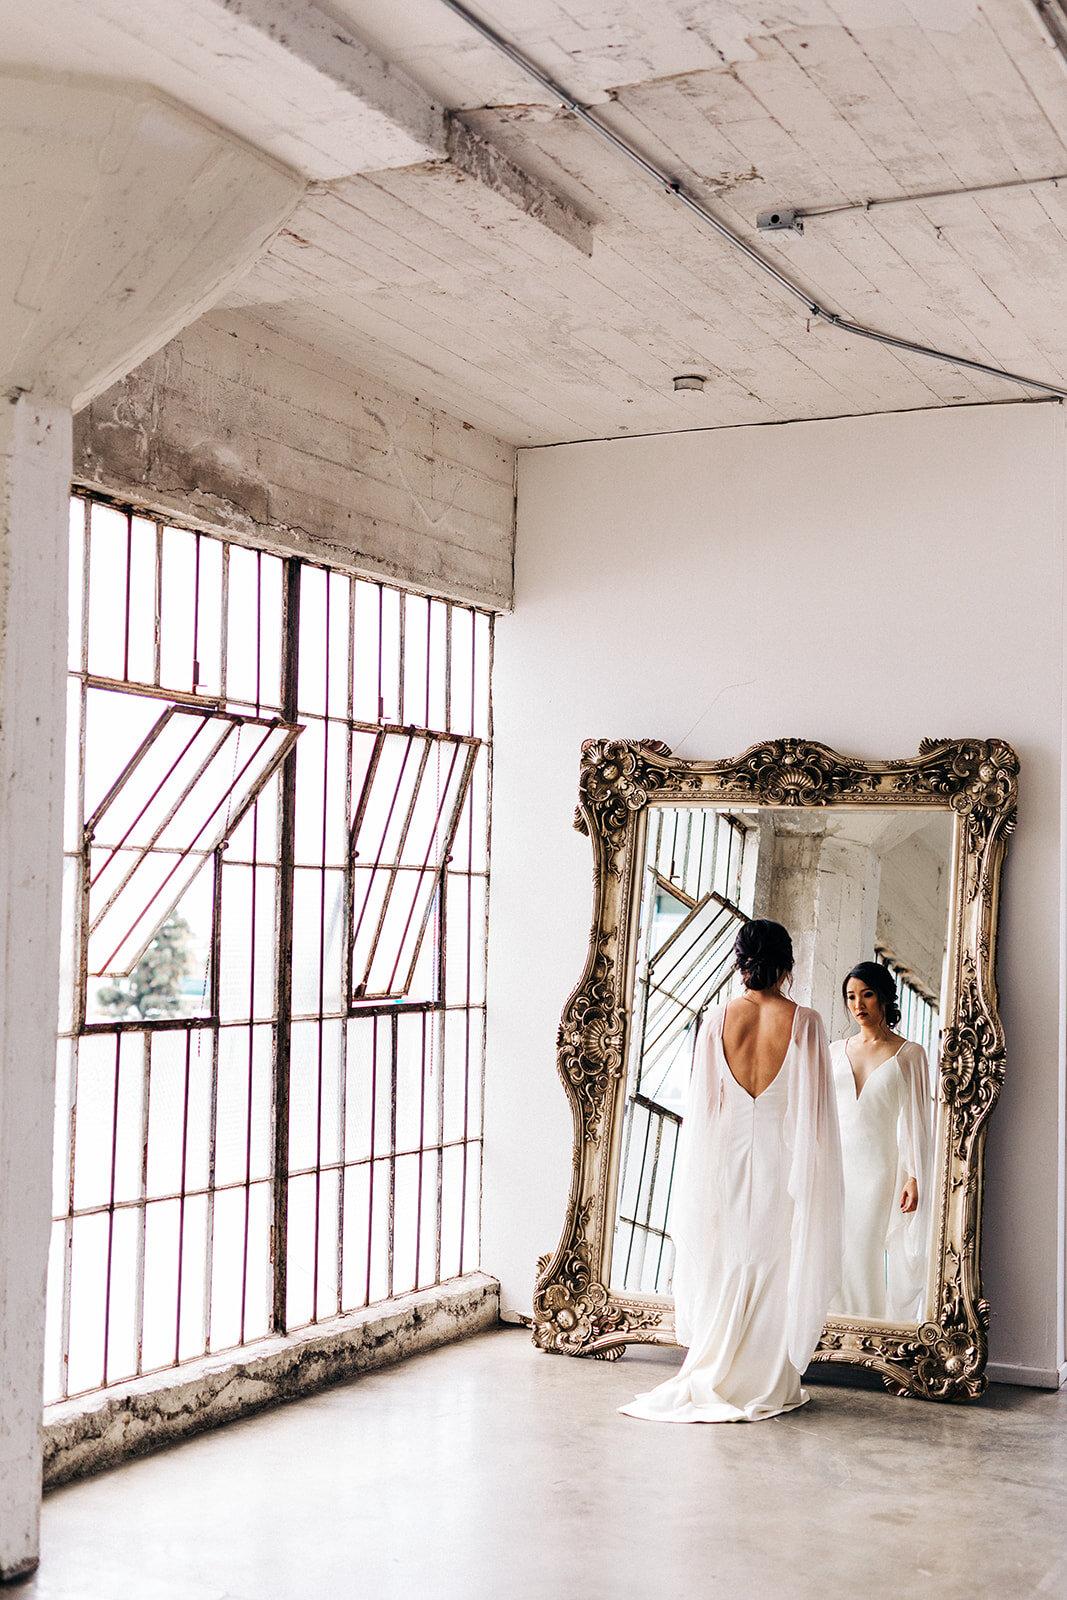 Tom-and-Christine-Hudson-Loft-Downtown-Los-Angeles-Brandon-J-Ferlin-Wedding-Photography-92.jpg